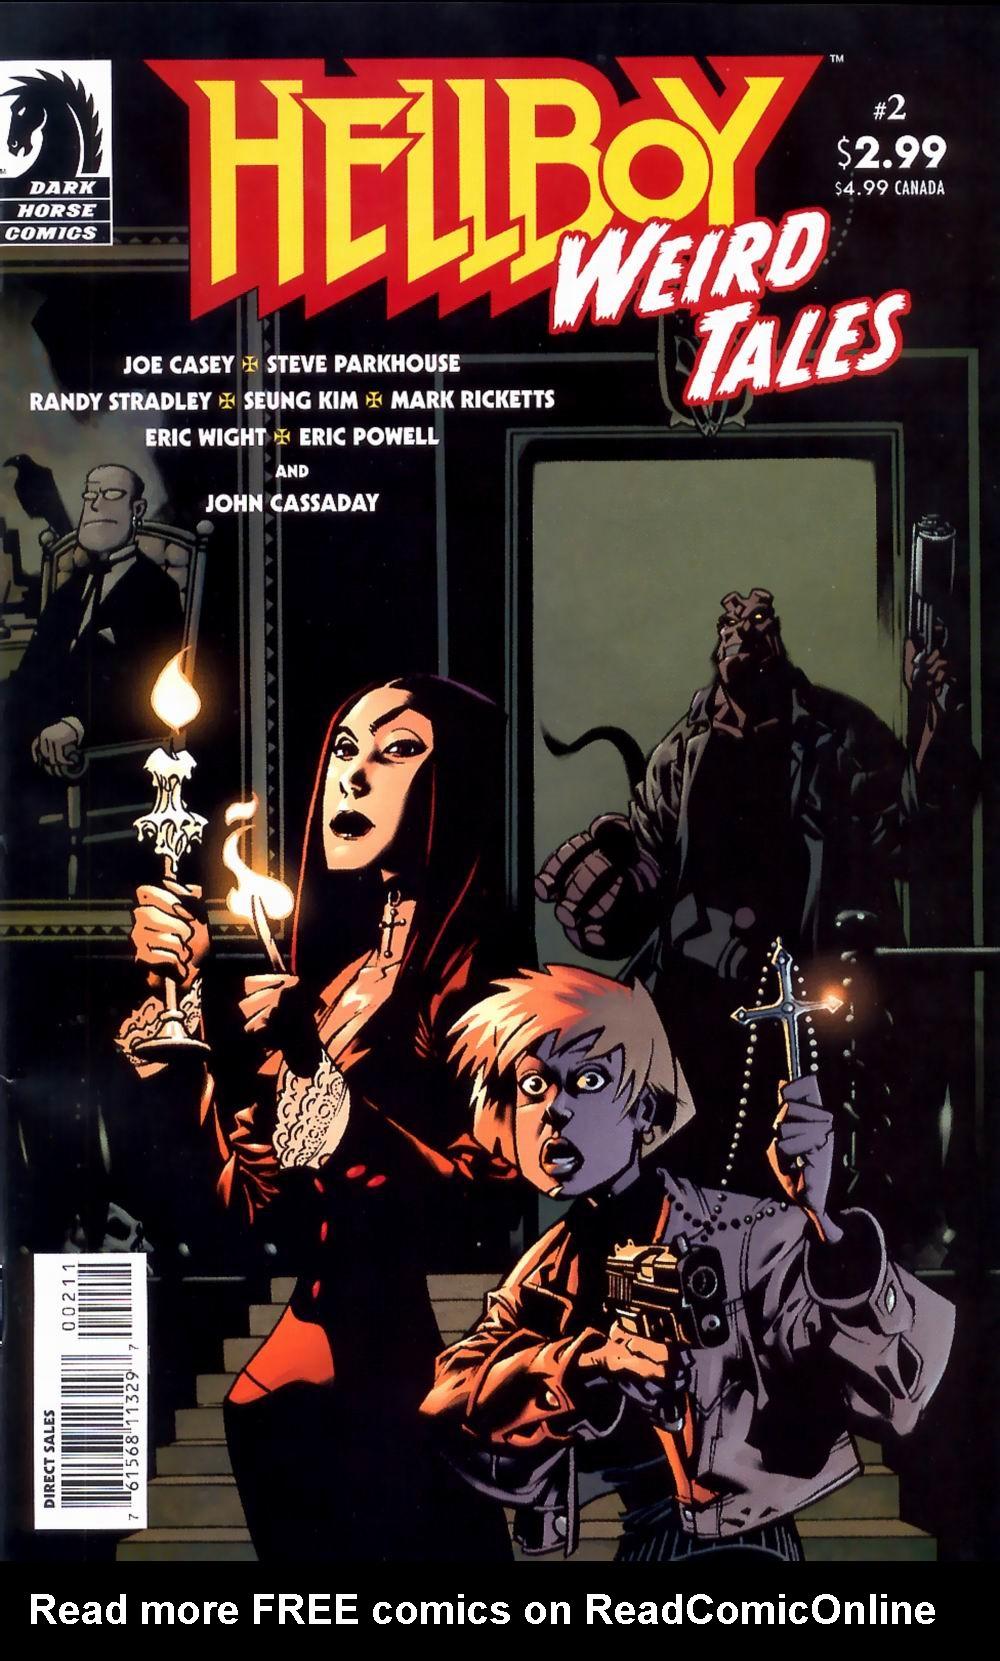 Read online Hellboy: Weird Tales comic -  Issue #2 - 1